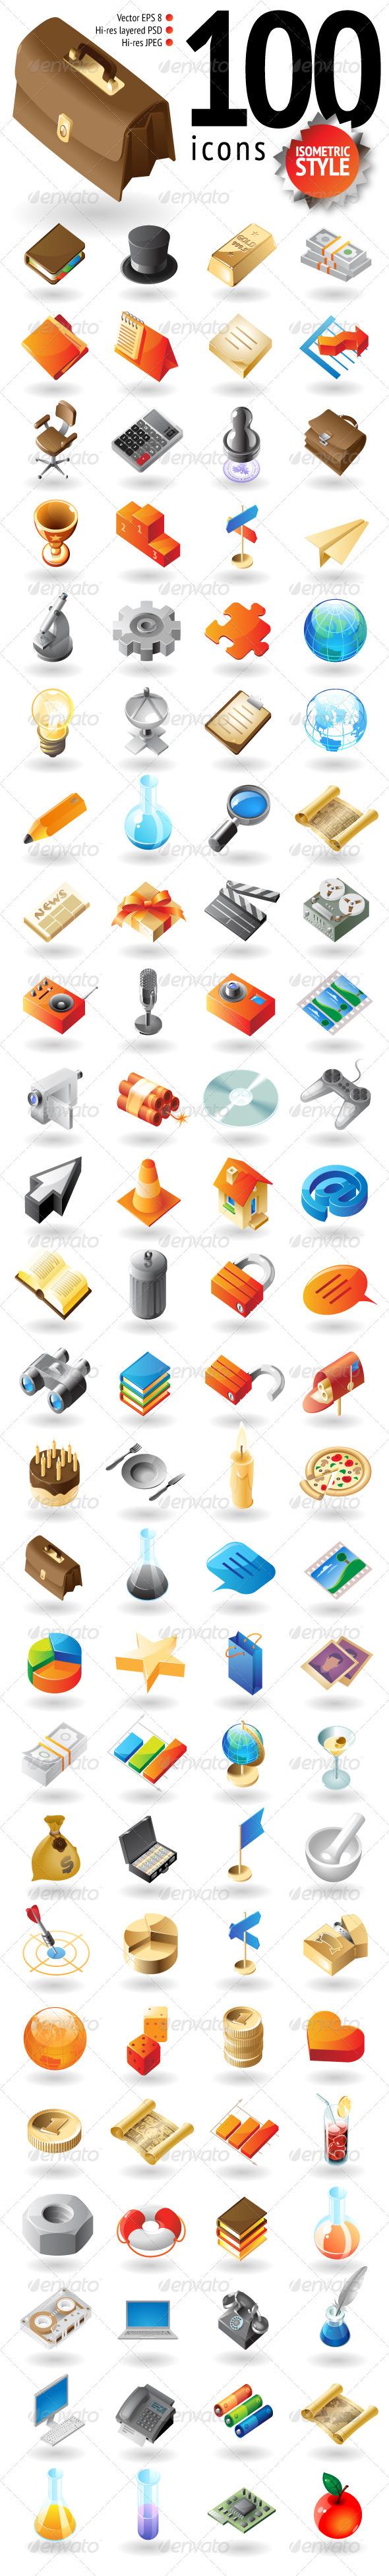 GraphicRiver 100 Isometric-Style Icons 3567173